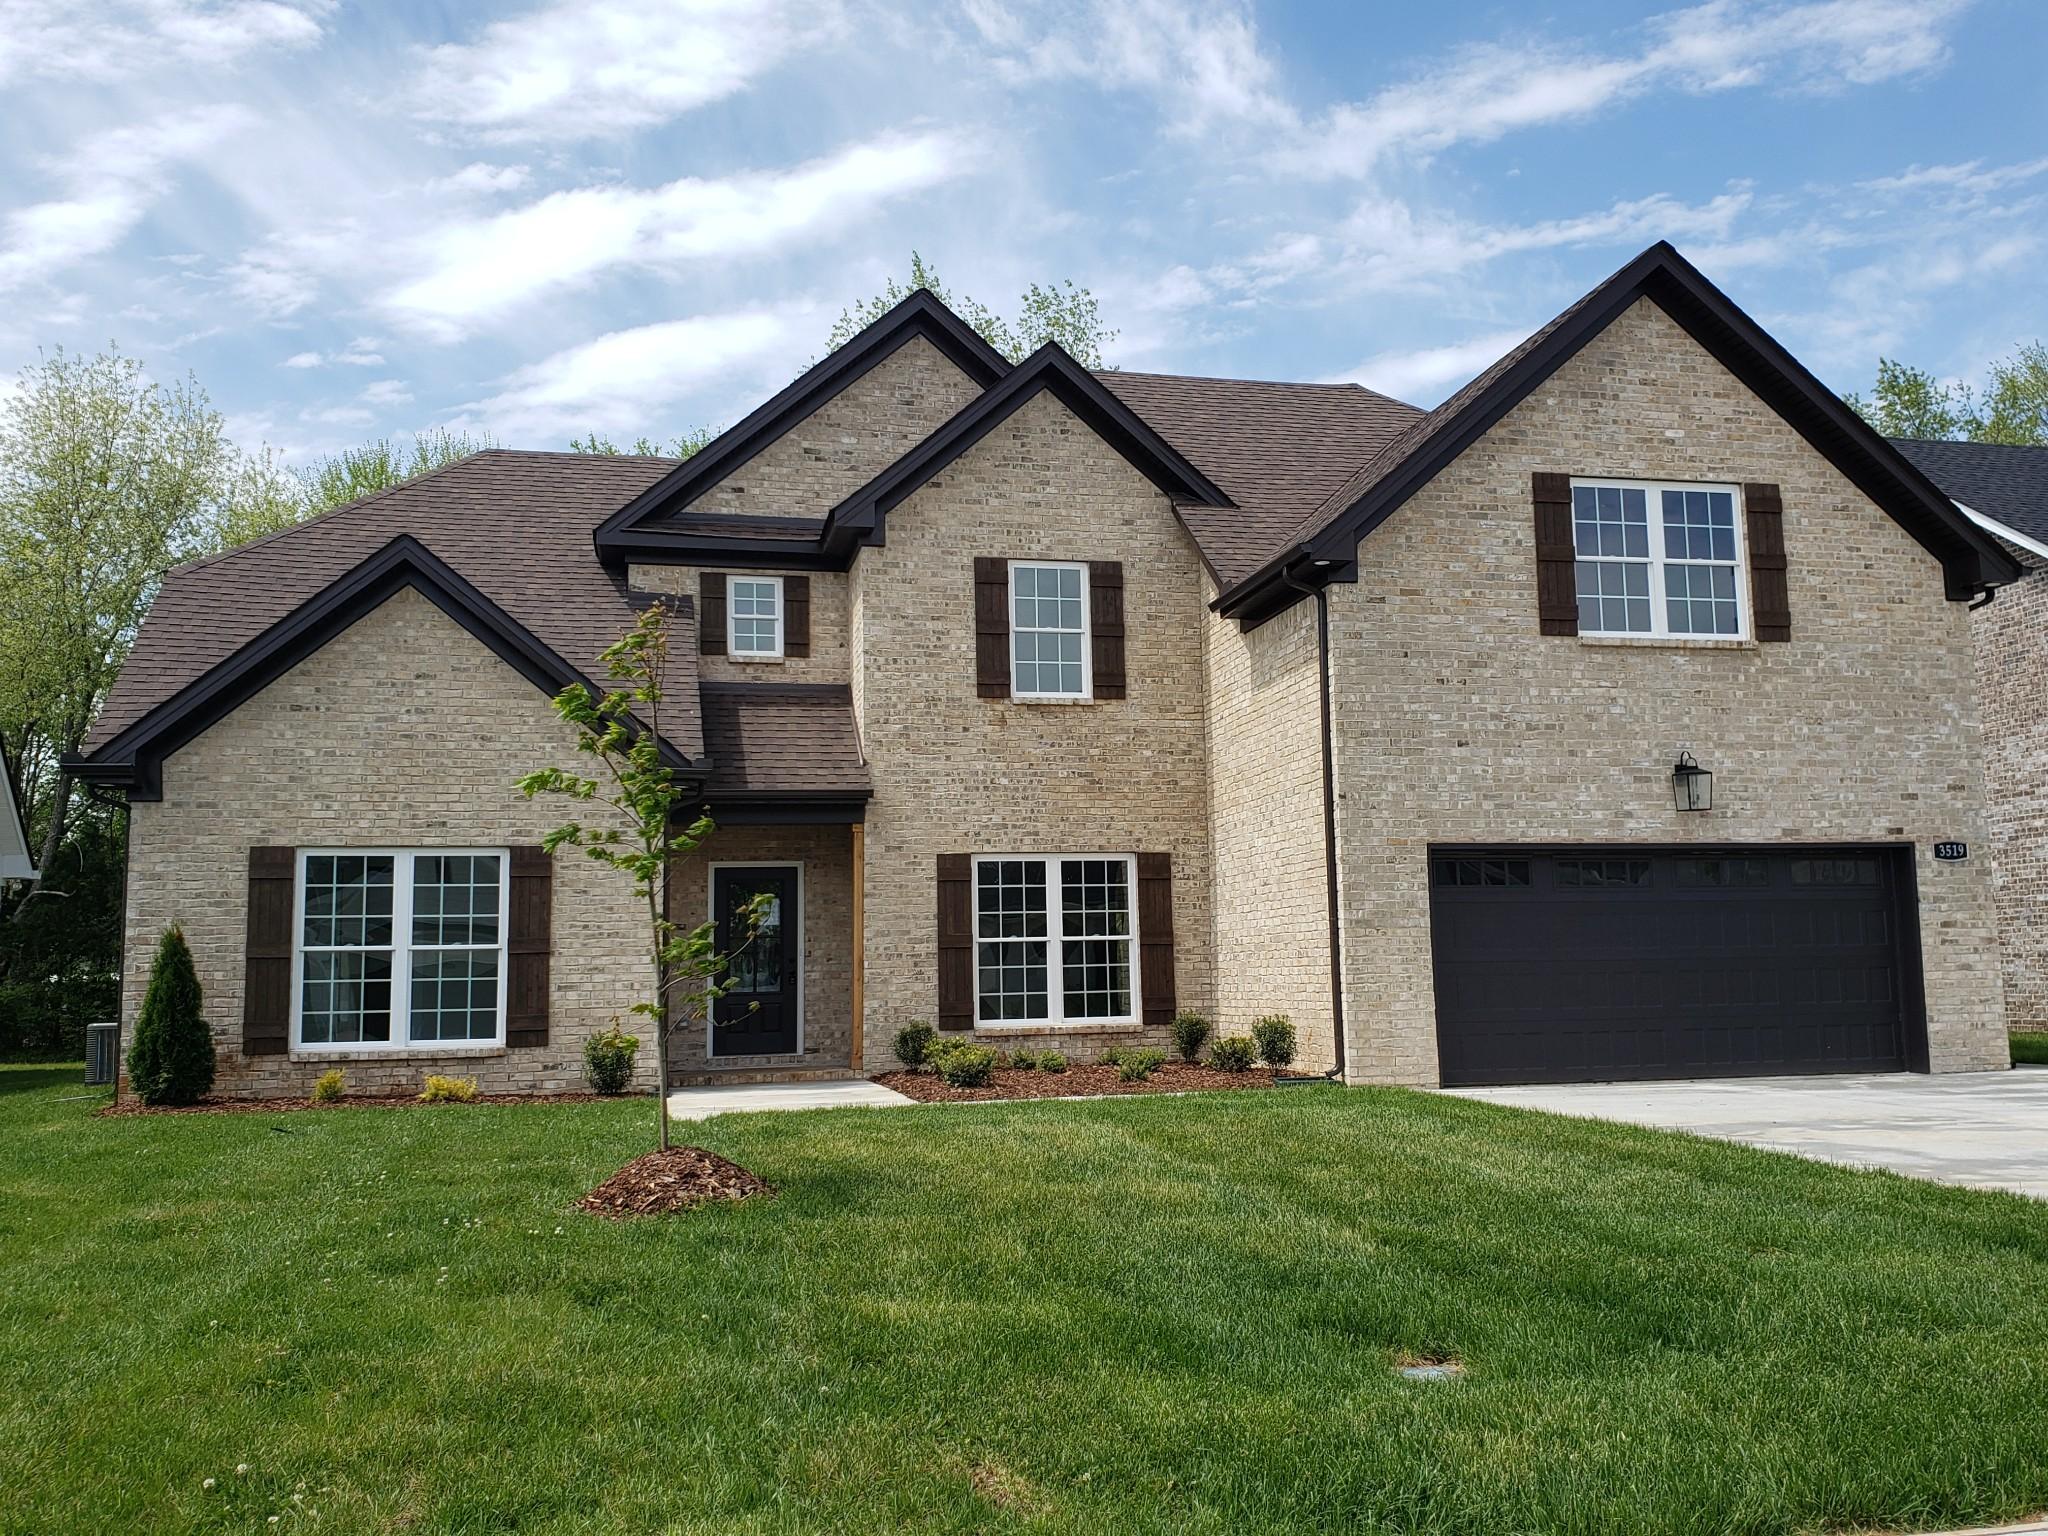 3519 Pershing Dr.- Lot 13, Murfreesboro, TN 37129 - Murfreesboro, TN real estate listing